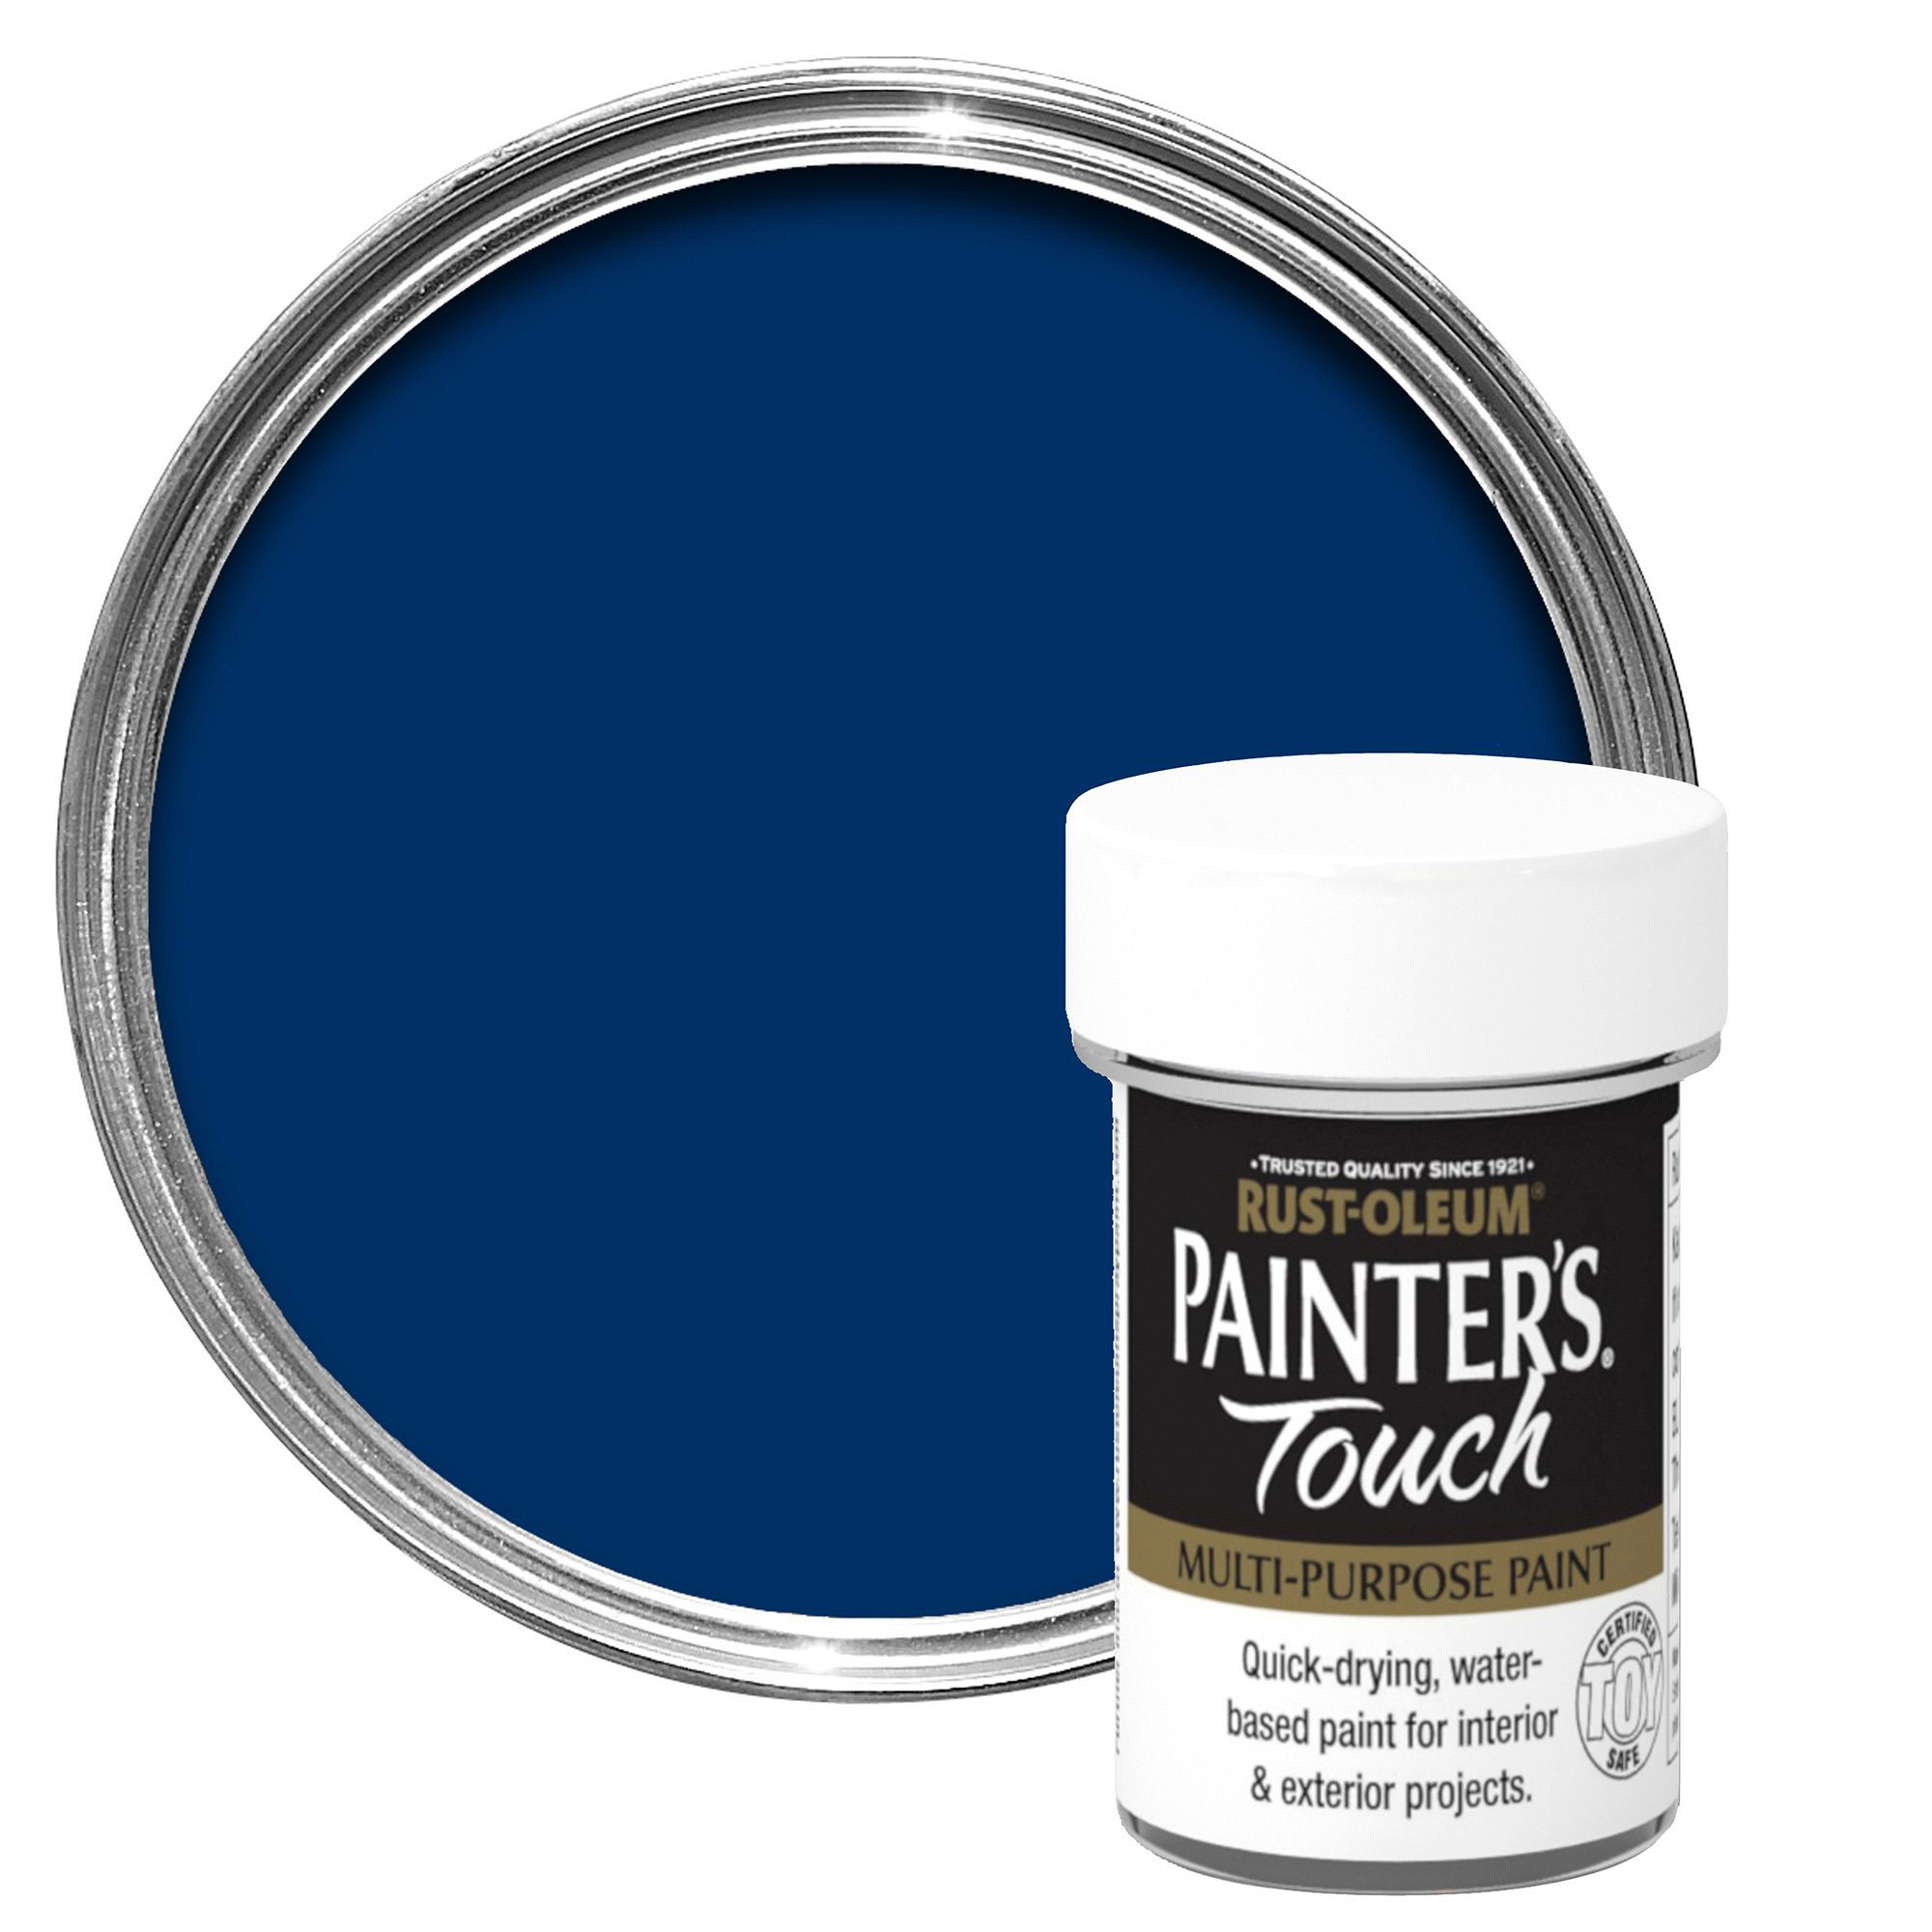 Rust-oleum Painter's Touch Interior & Exterior Dark Blue Gloss Multipurpose Paint 20ml